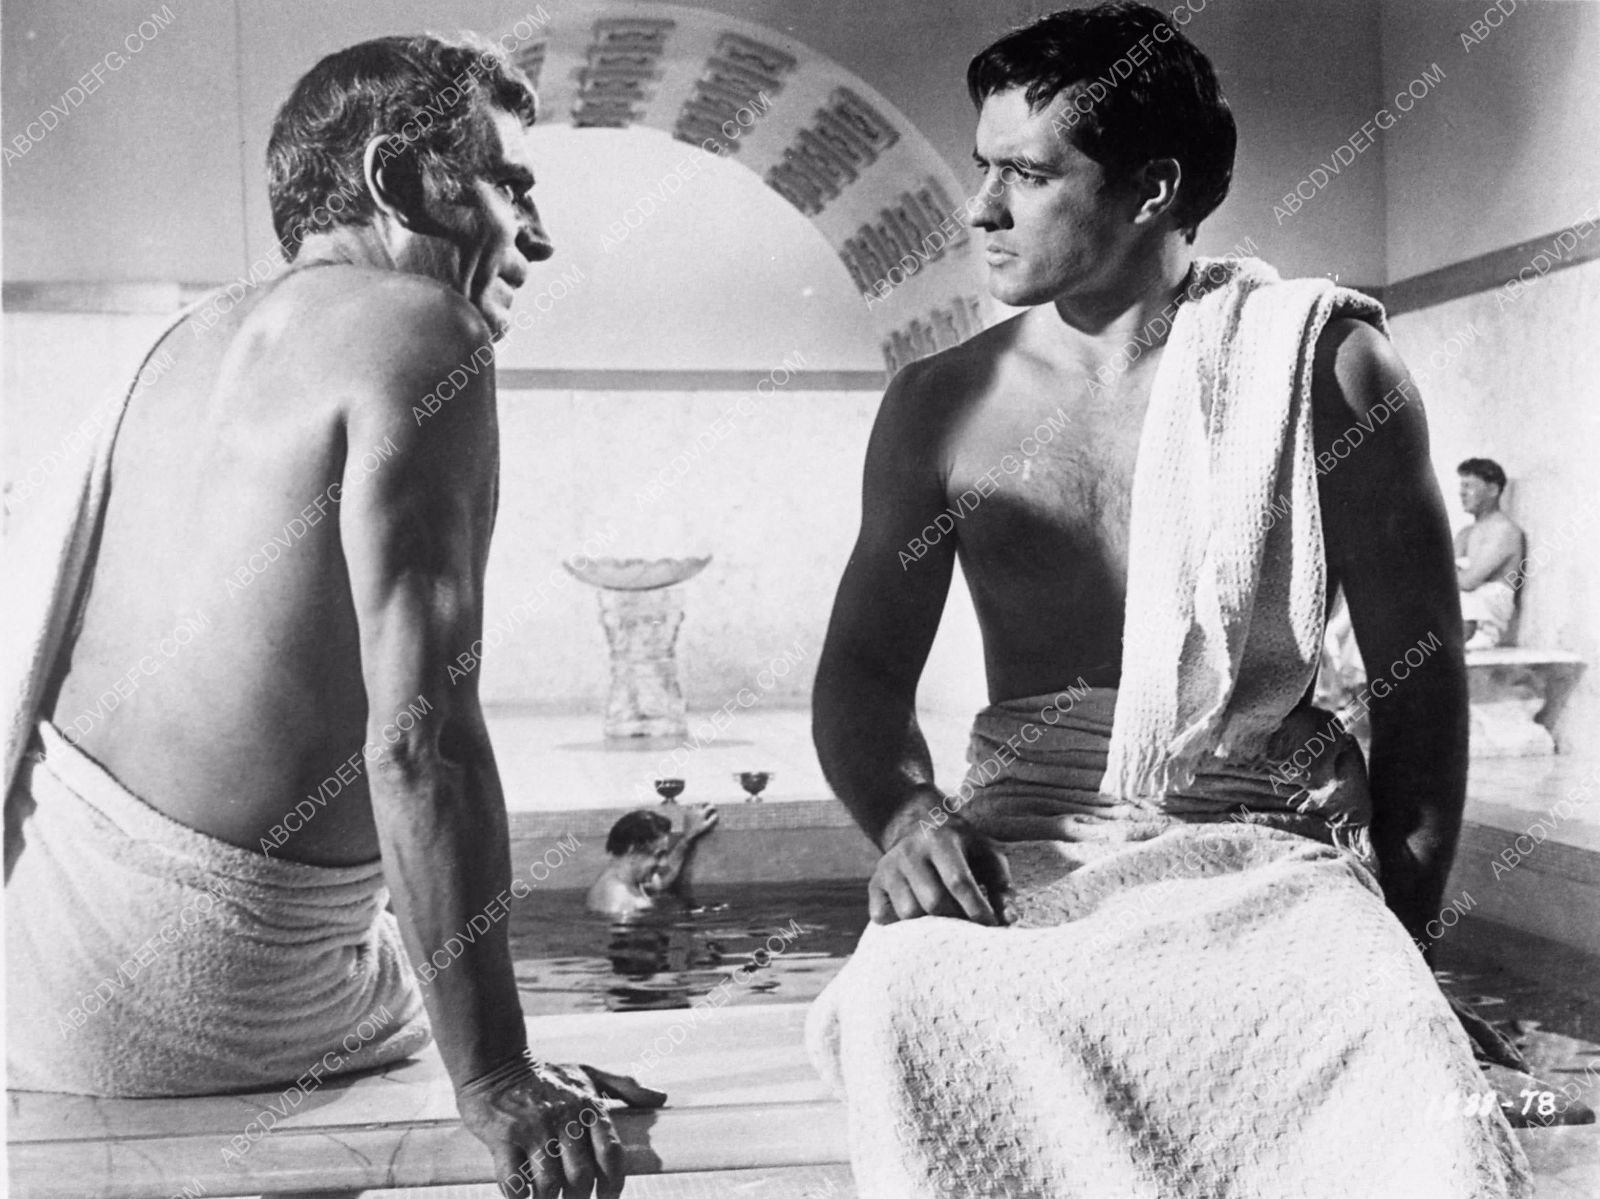 Laurence olivier spartacus quotes - Photo Spartacus Bathtub Bath House Scene 1391 30